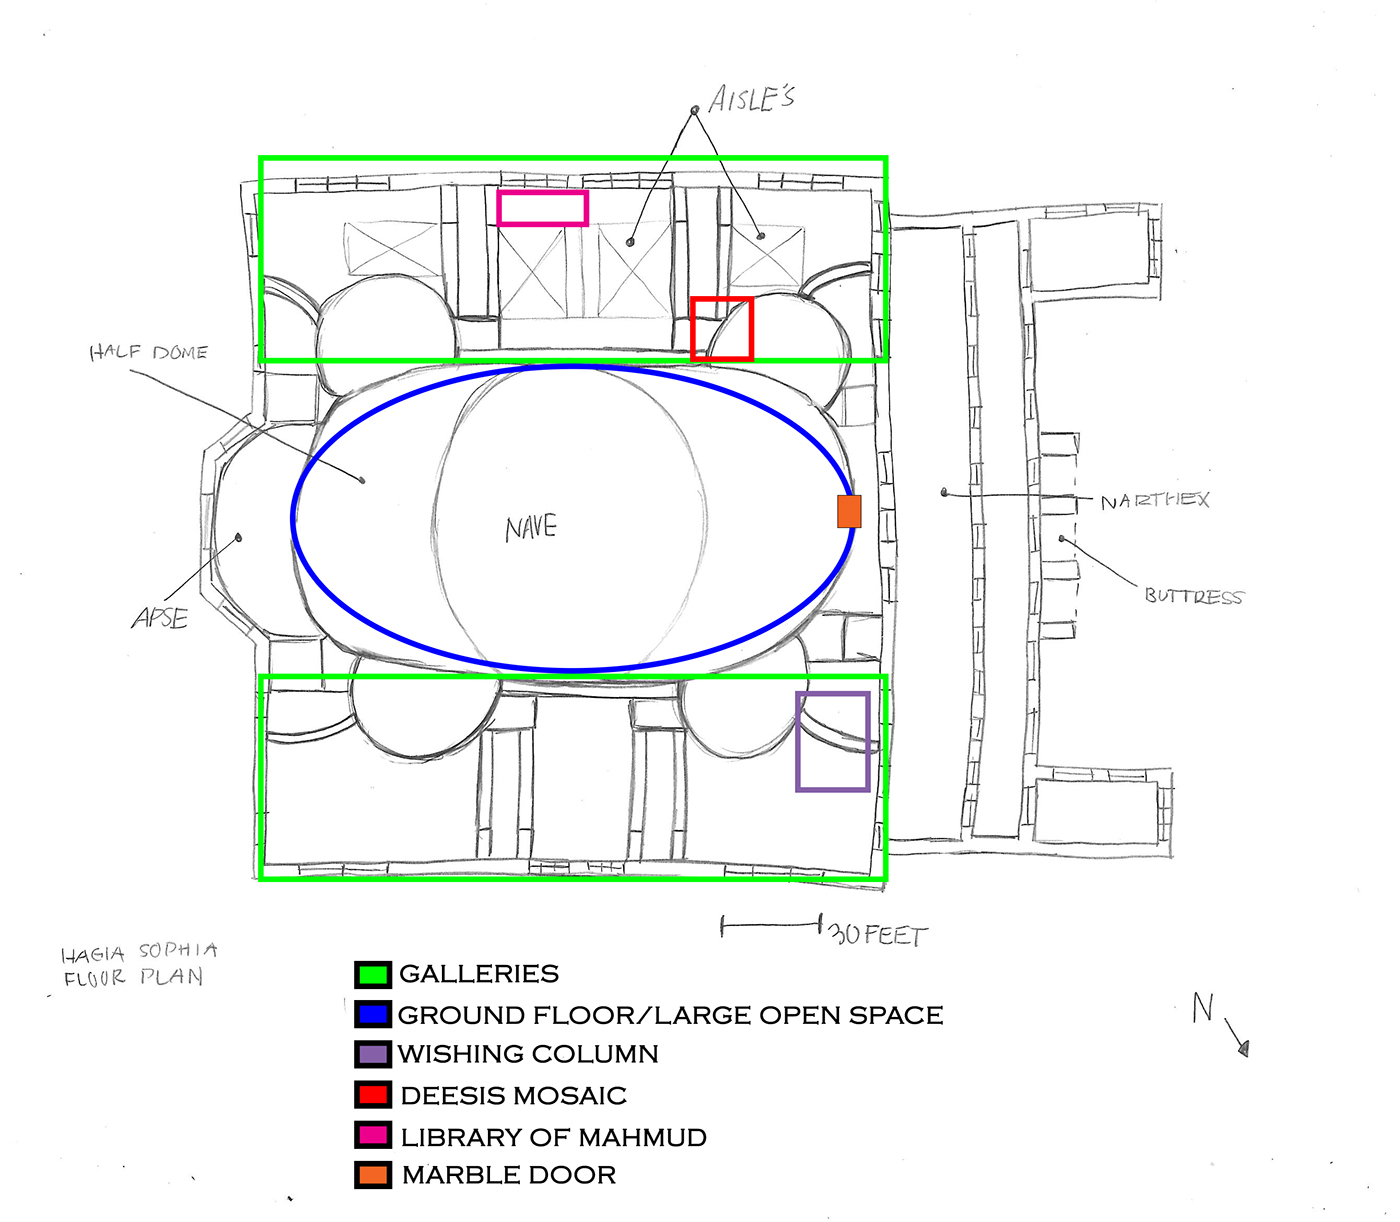 Hagia sophia research diagrams on behance for 1919 sophia floor plan